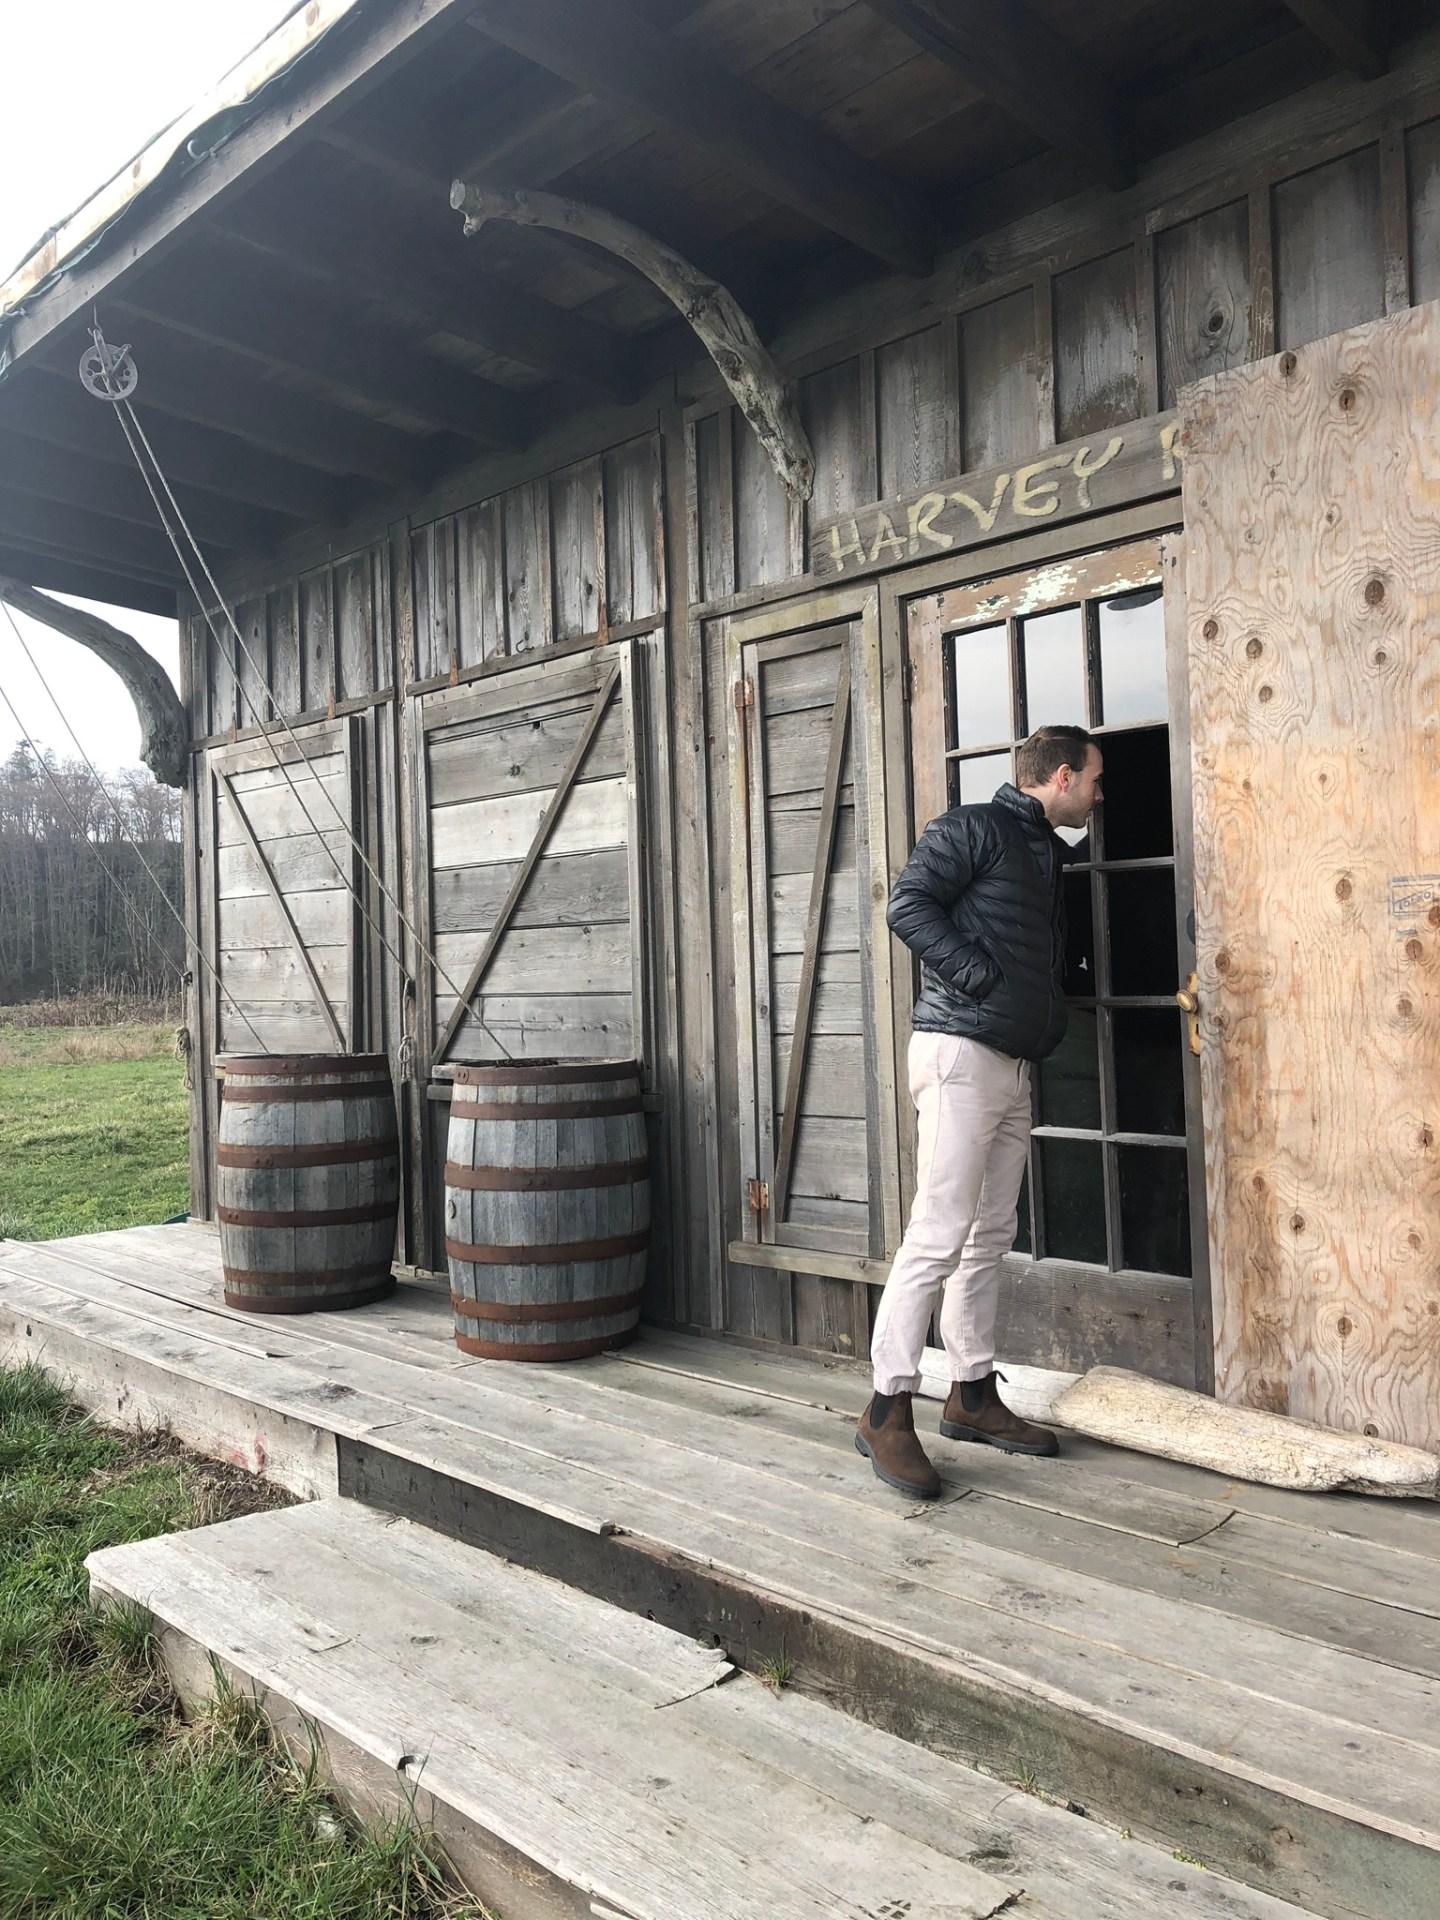 Taking a peek inside the hut on Vancouver Island